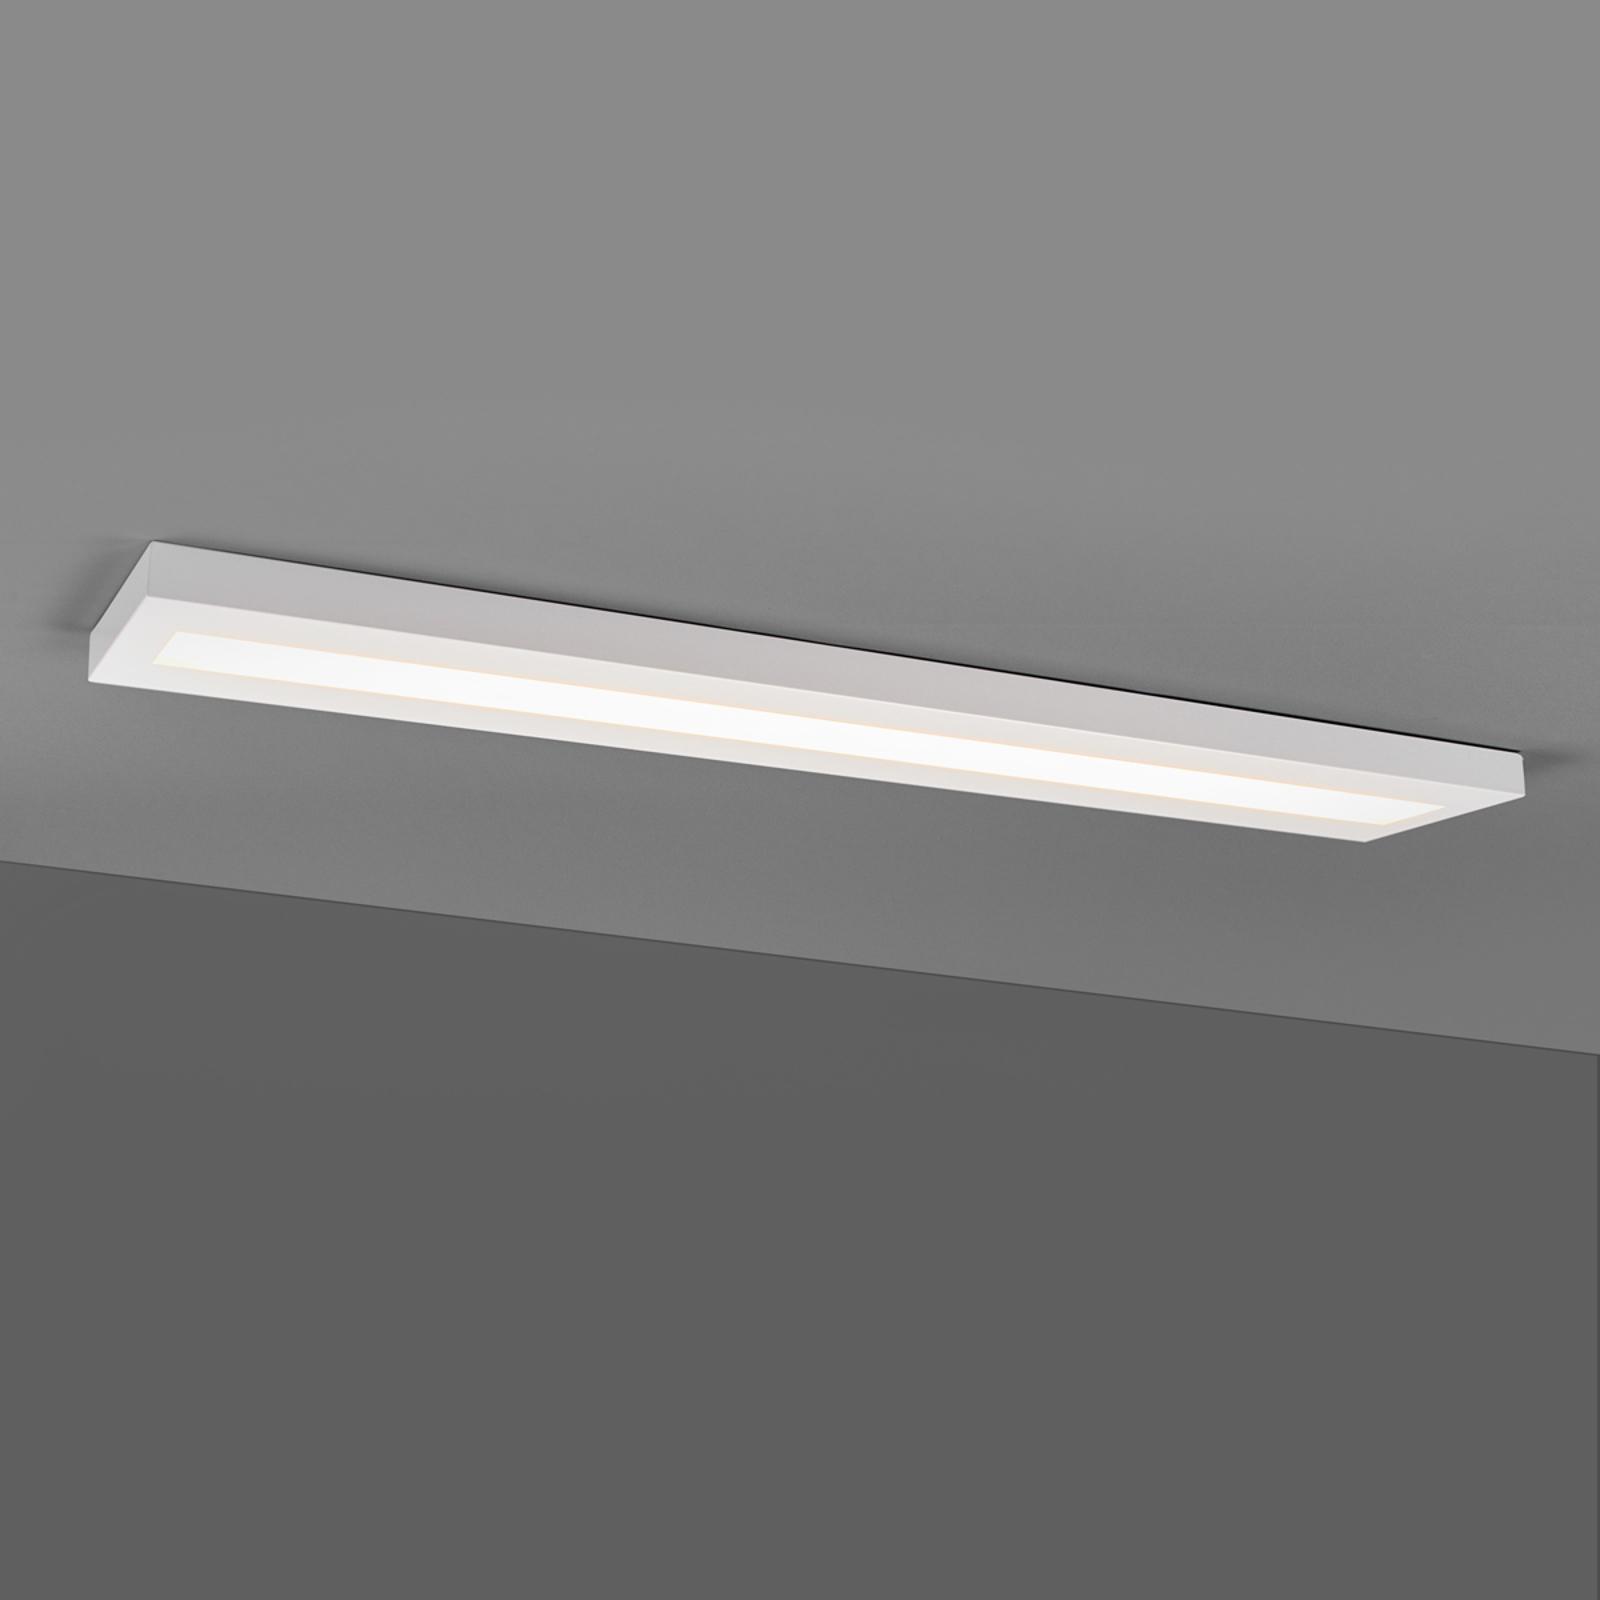 Lum. superf. LED alarg. 33 W blanca, BAP